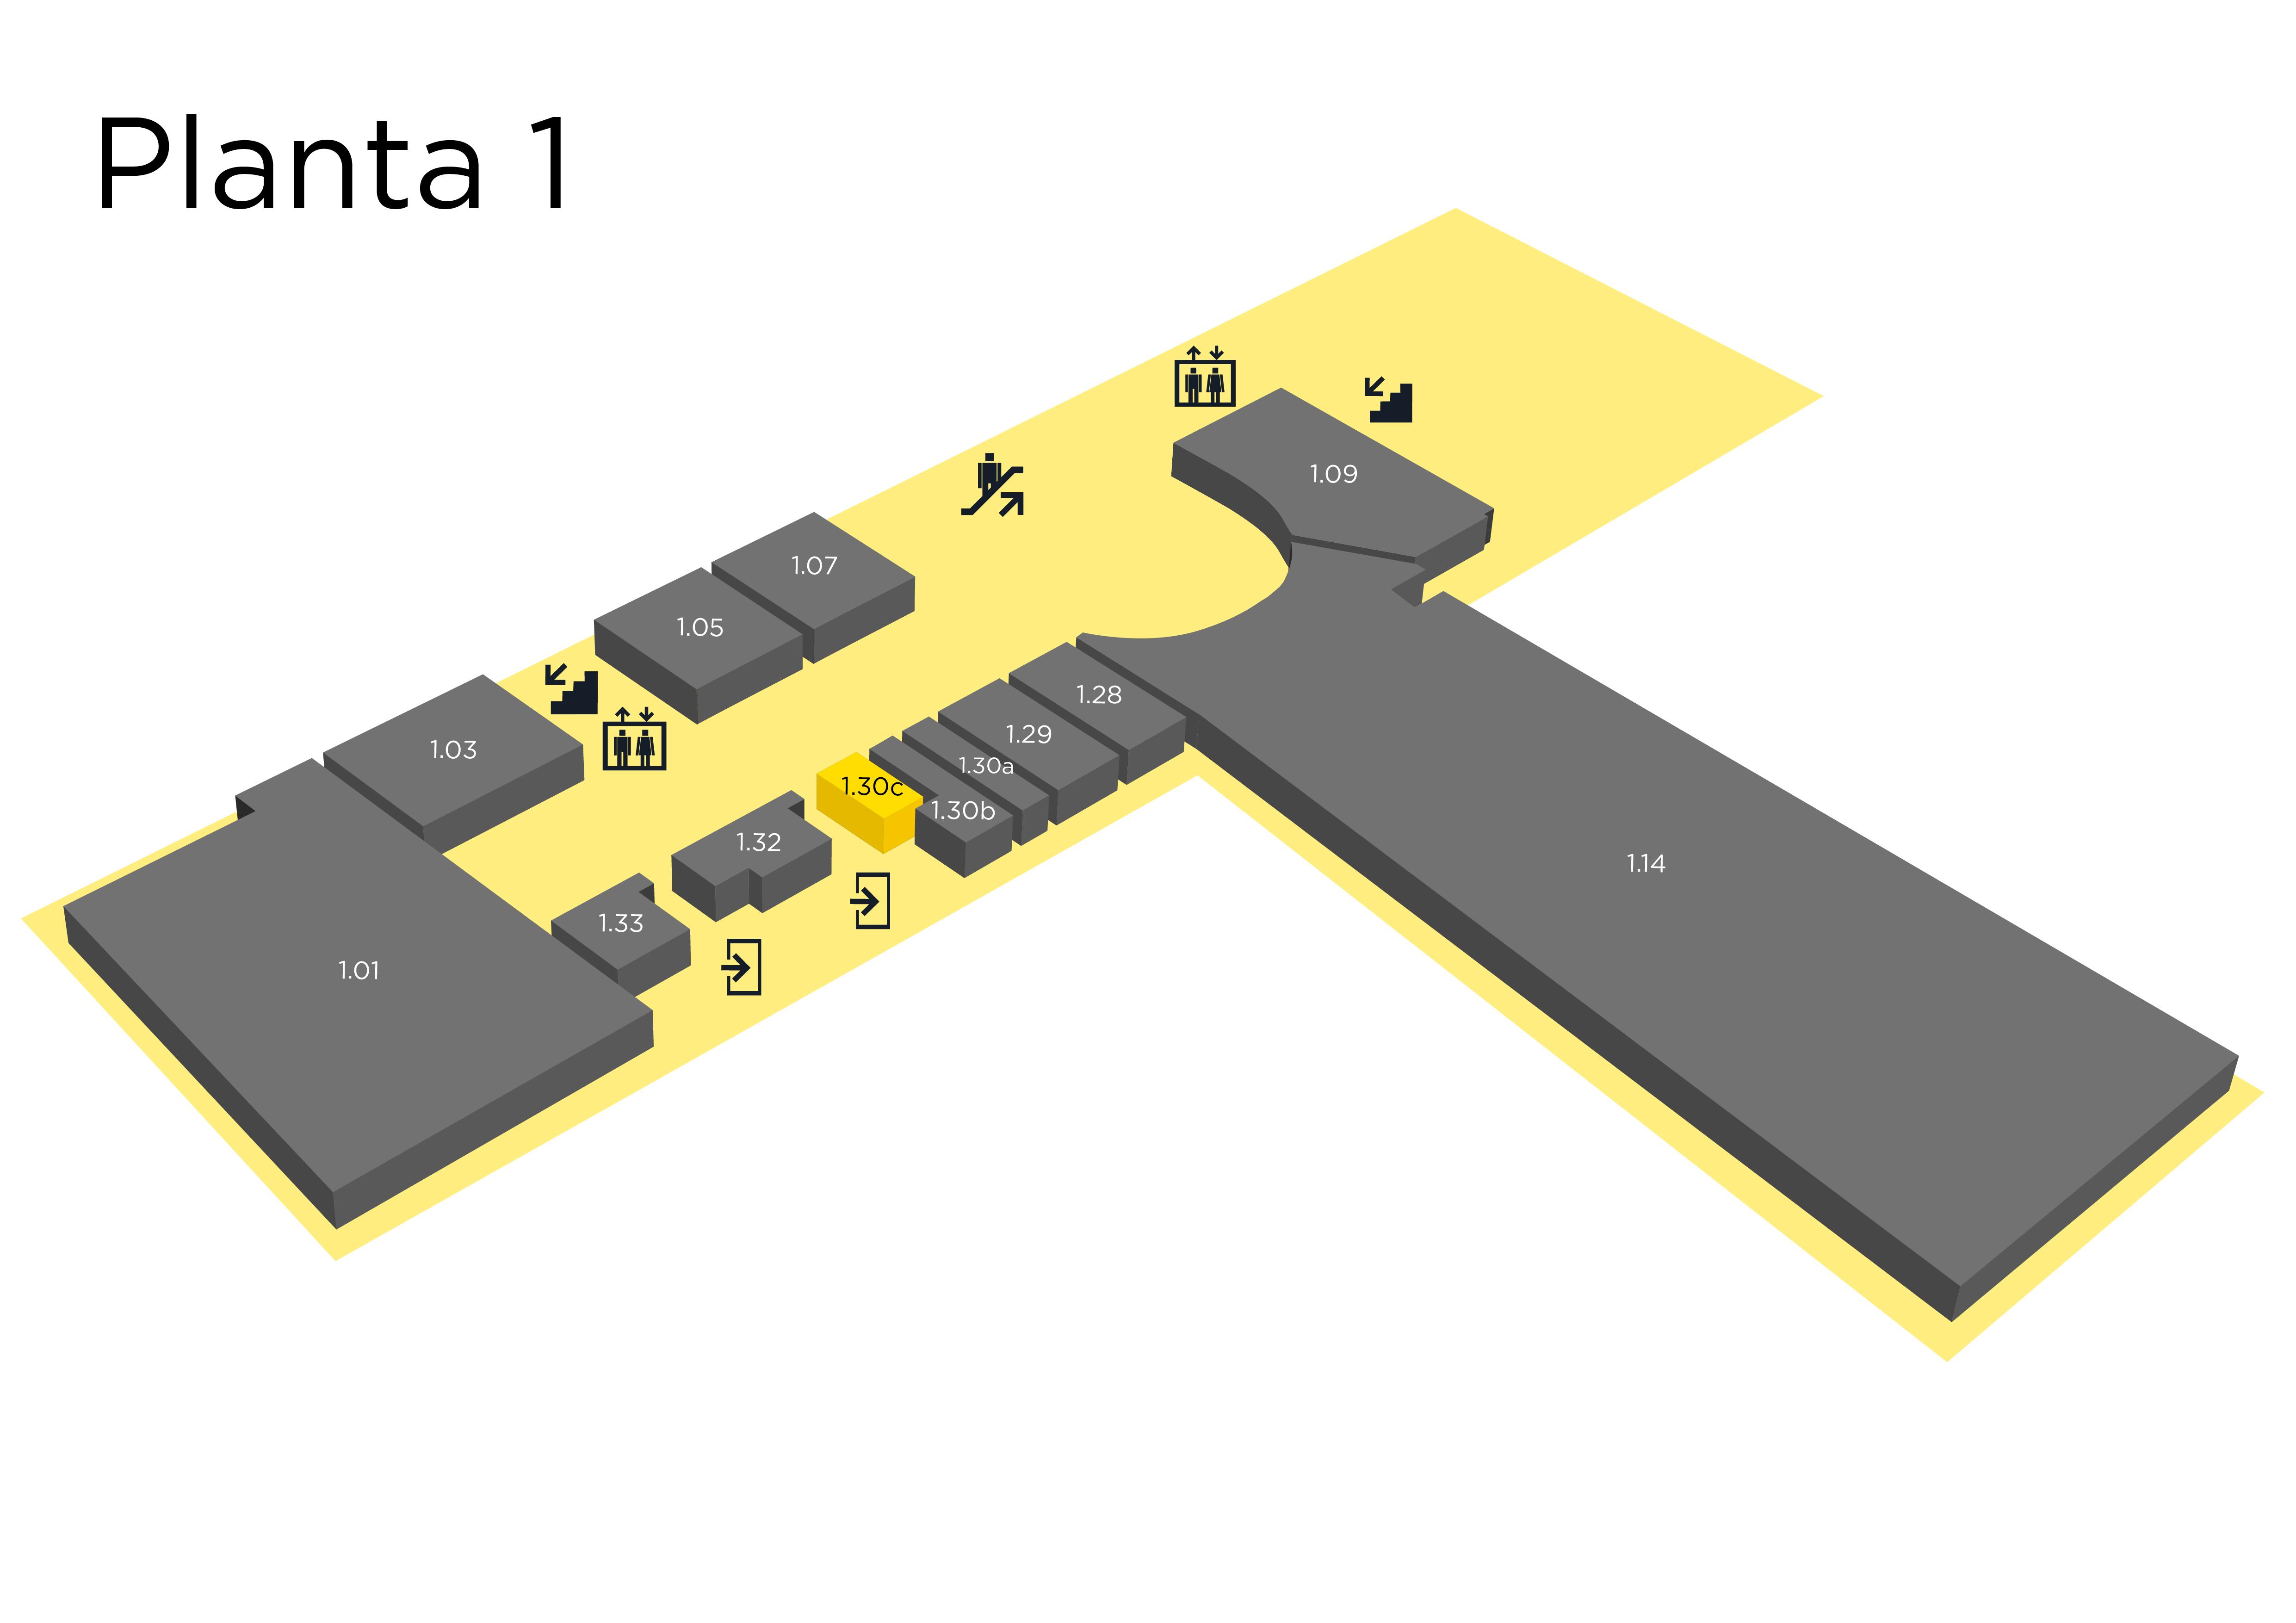 Planta1_130c loteria